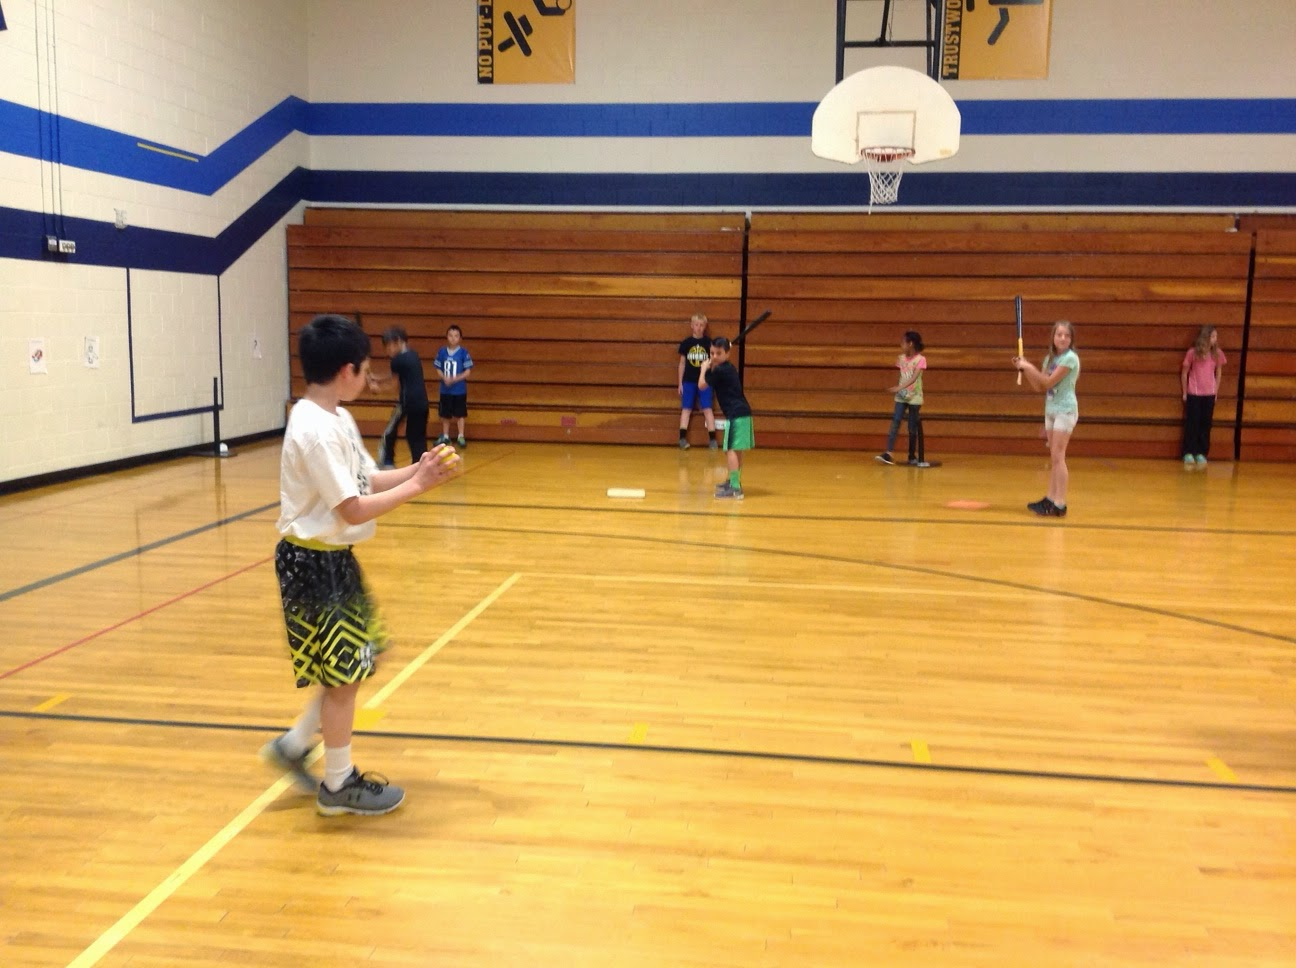 batting practice elementary physical education